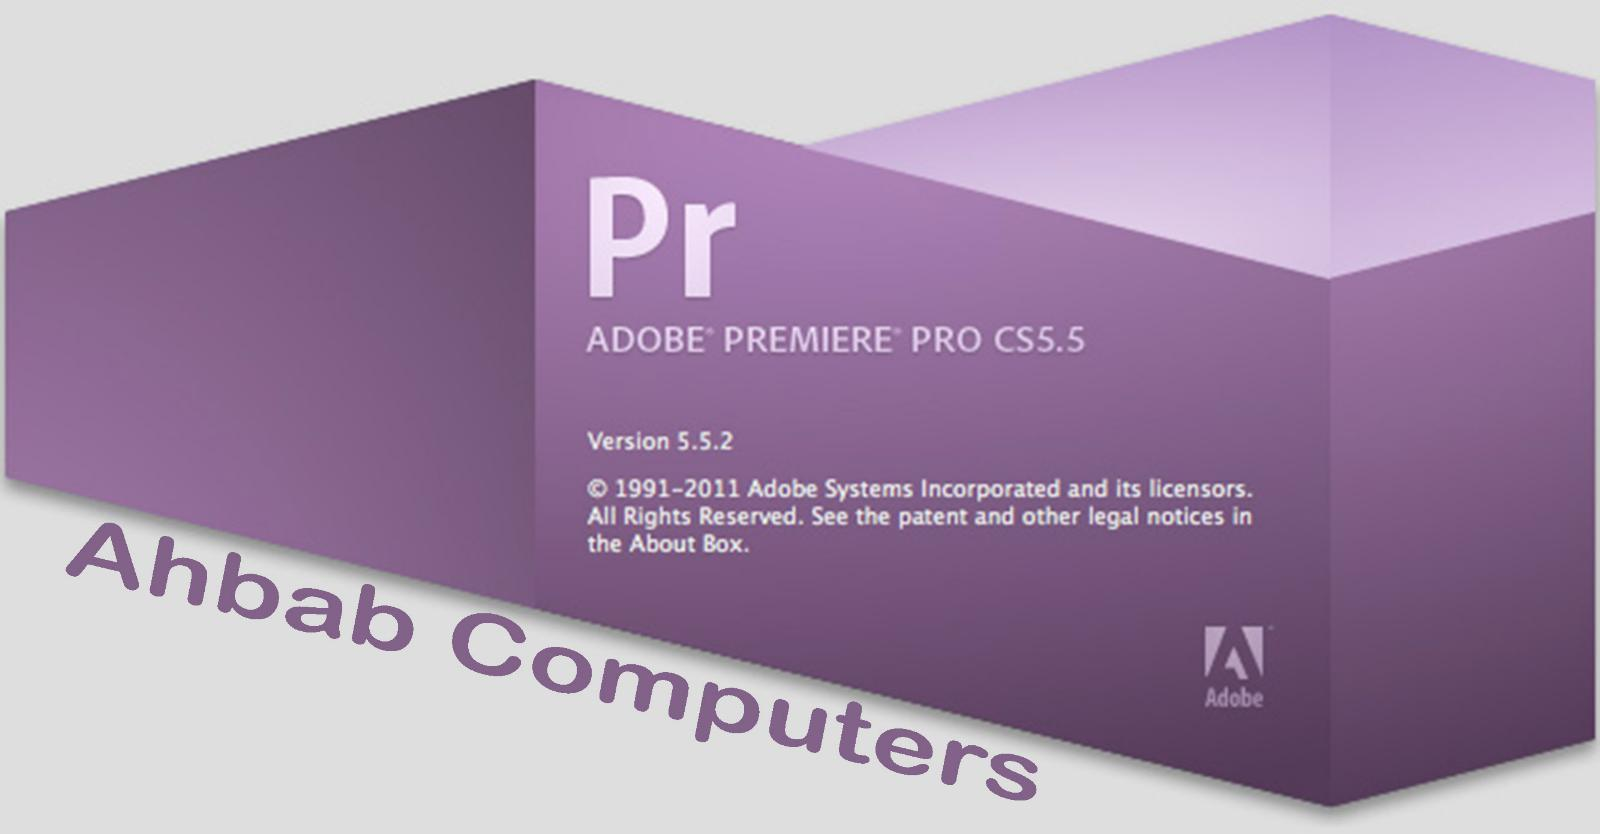 adobe premiere pro torrent download windows